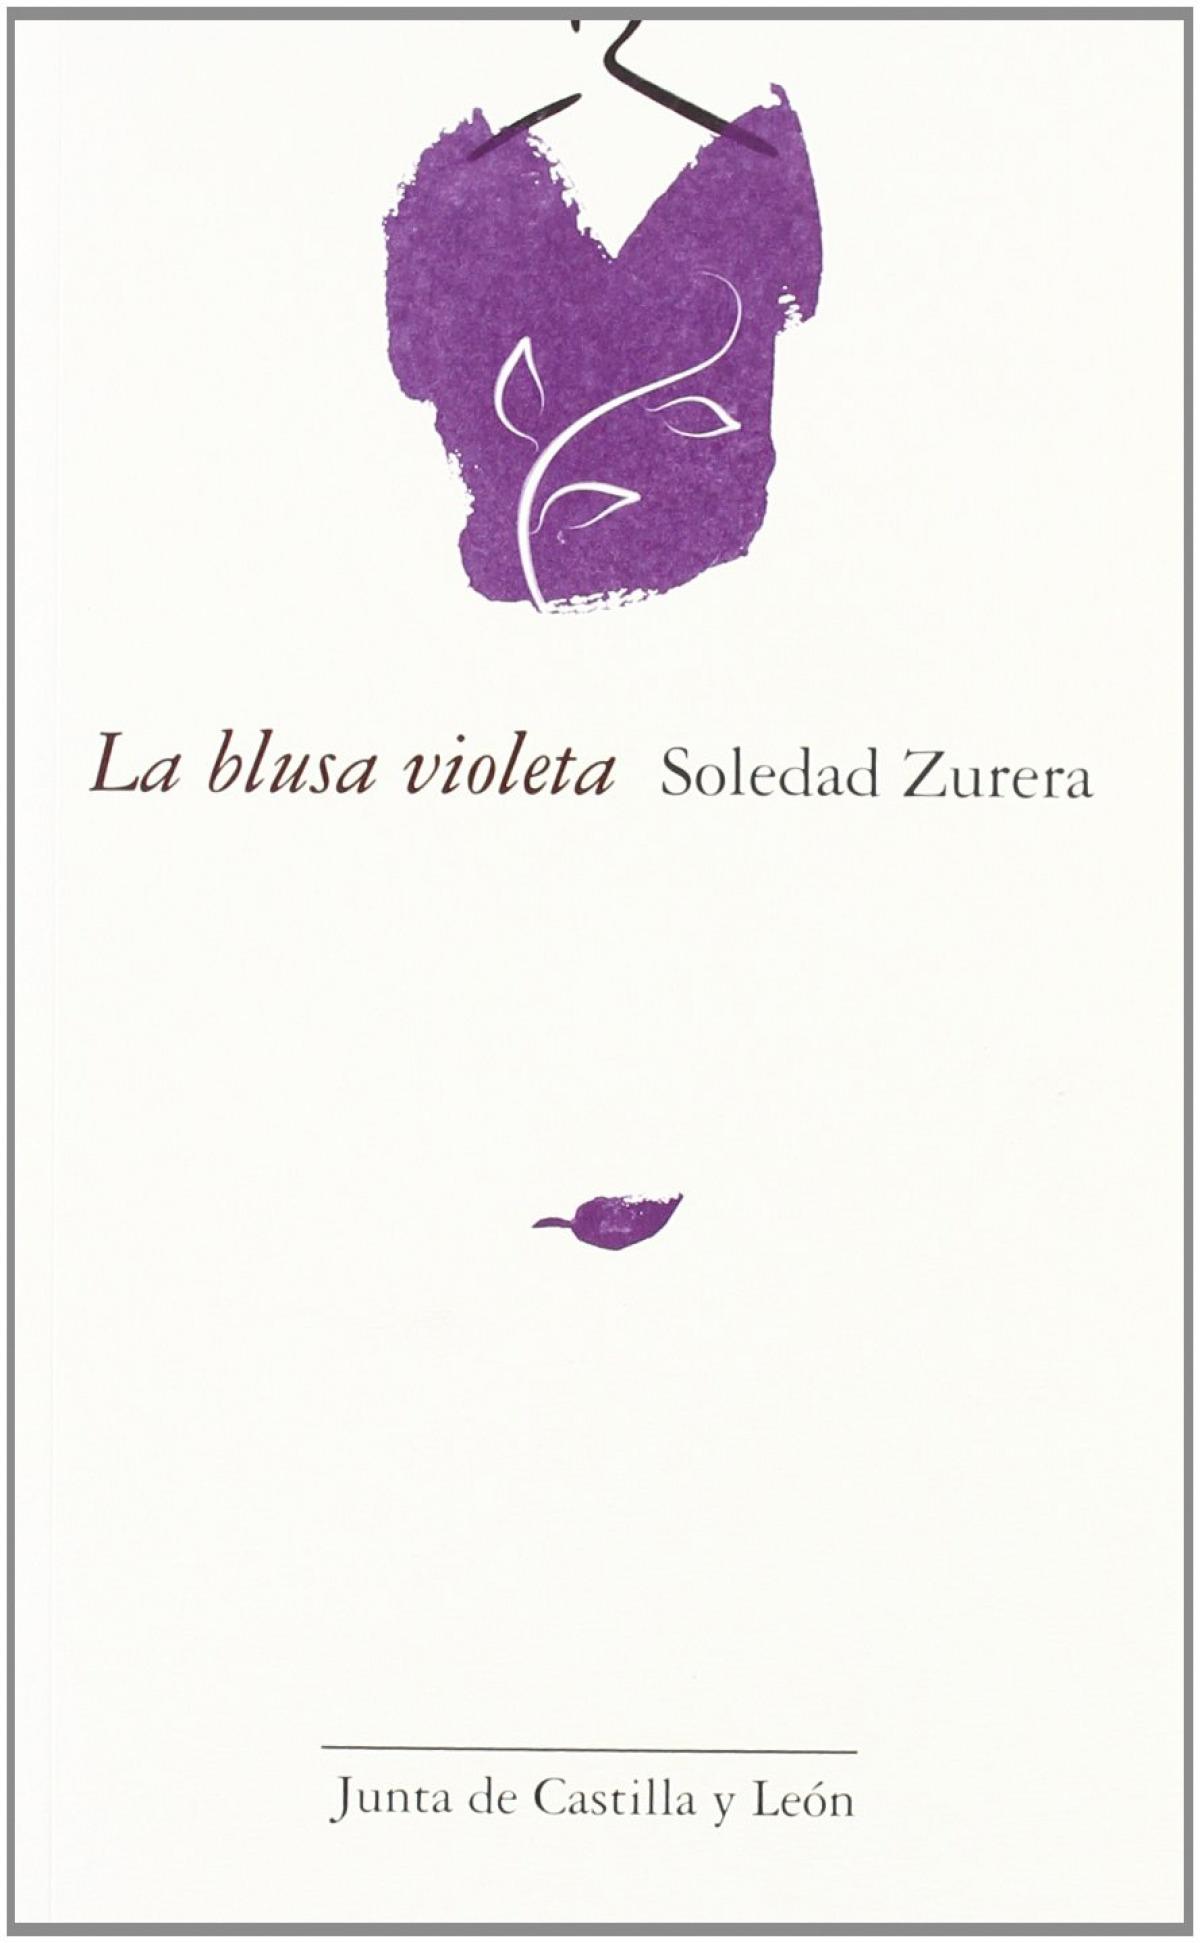 Blusa violeta, la - Zurera, Soledad